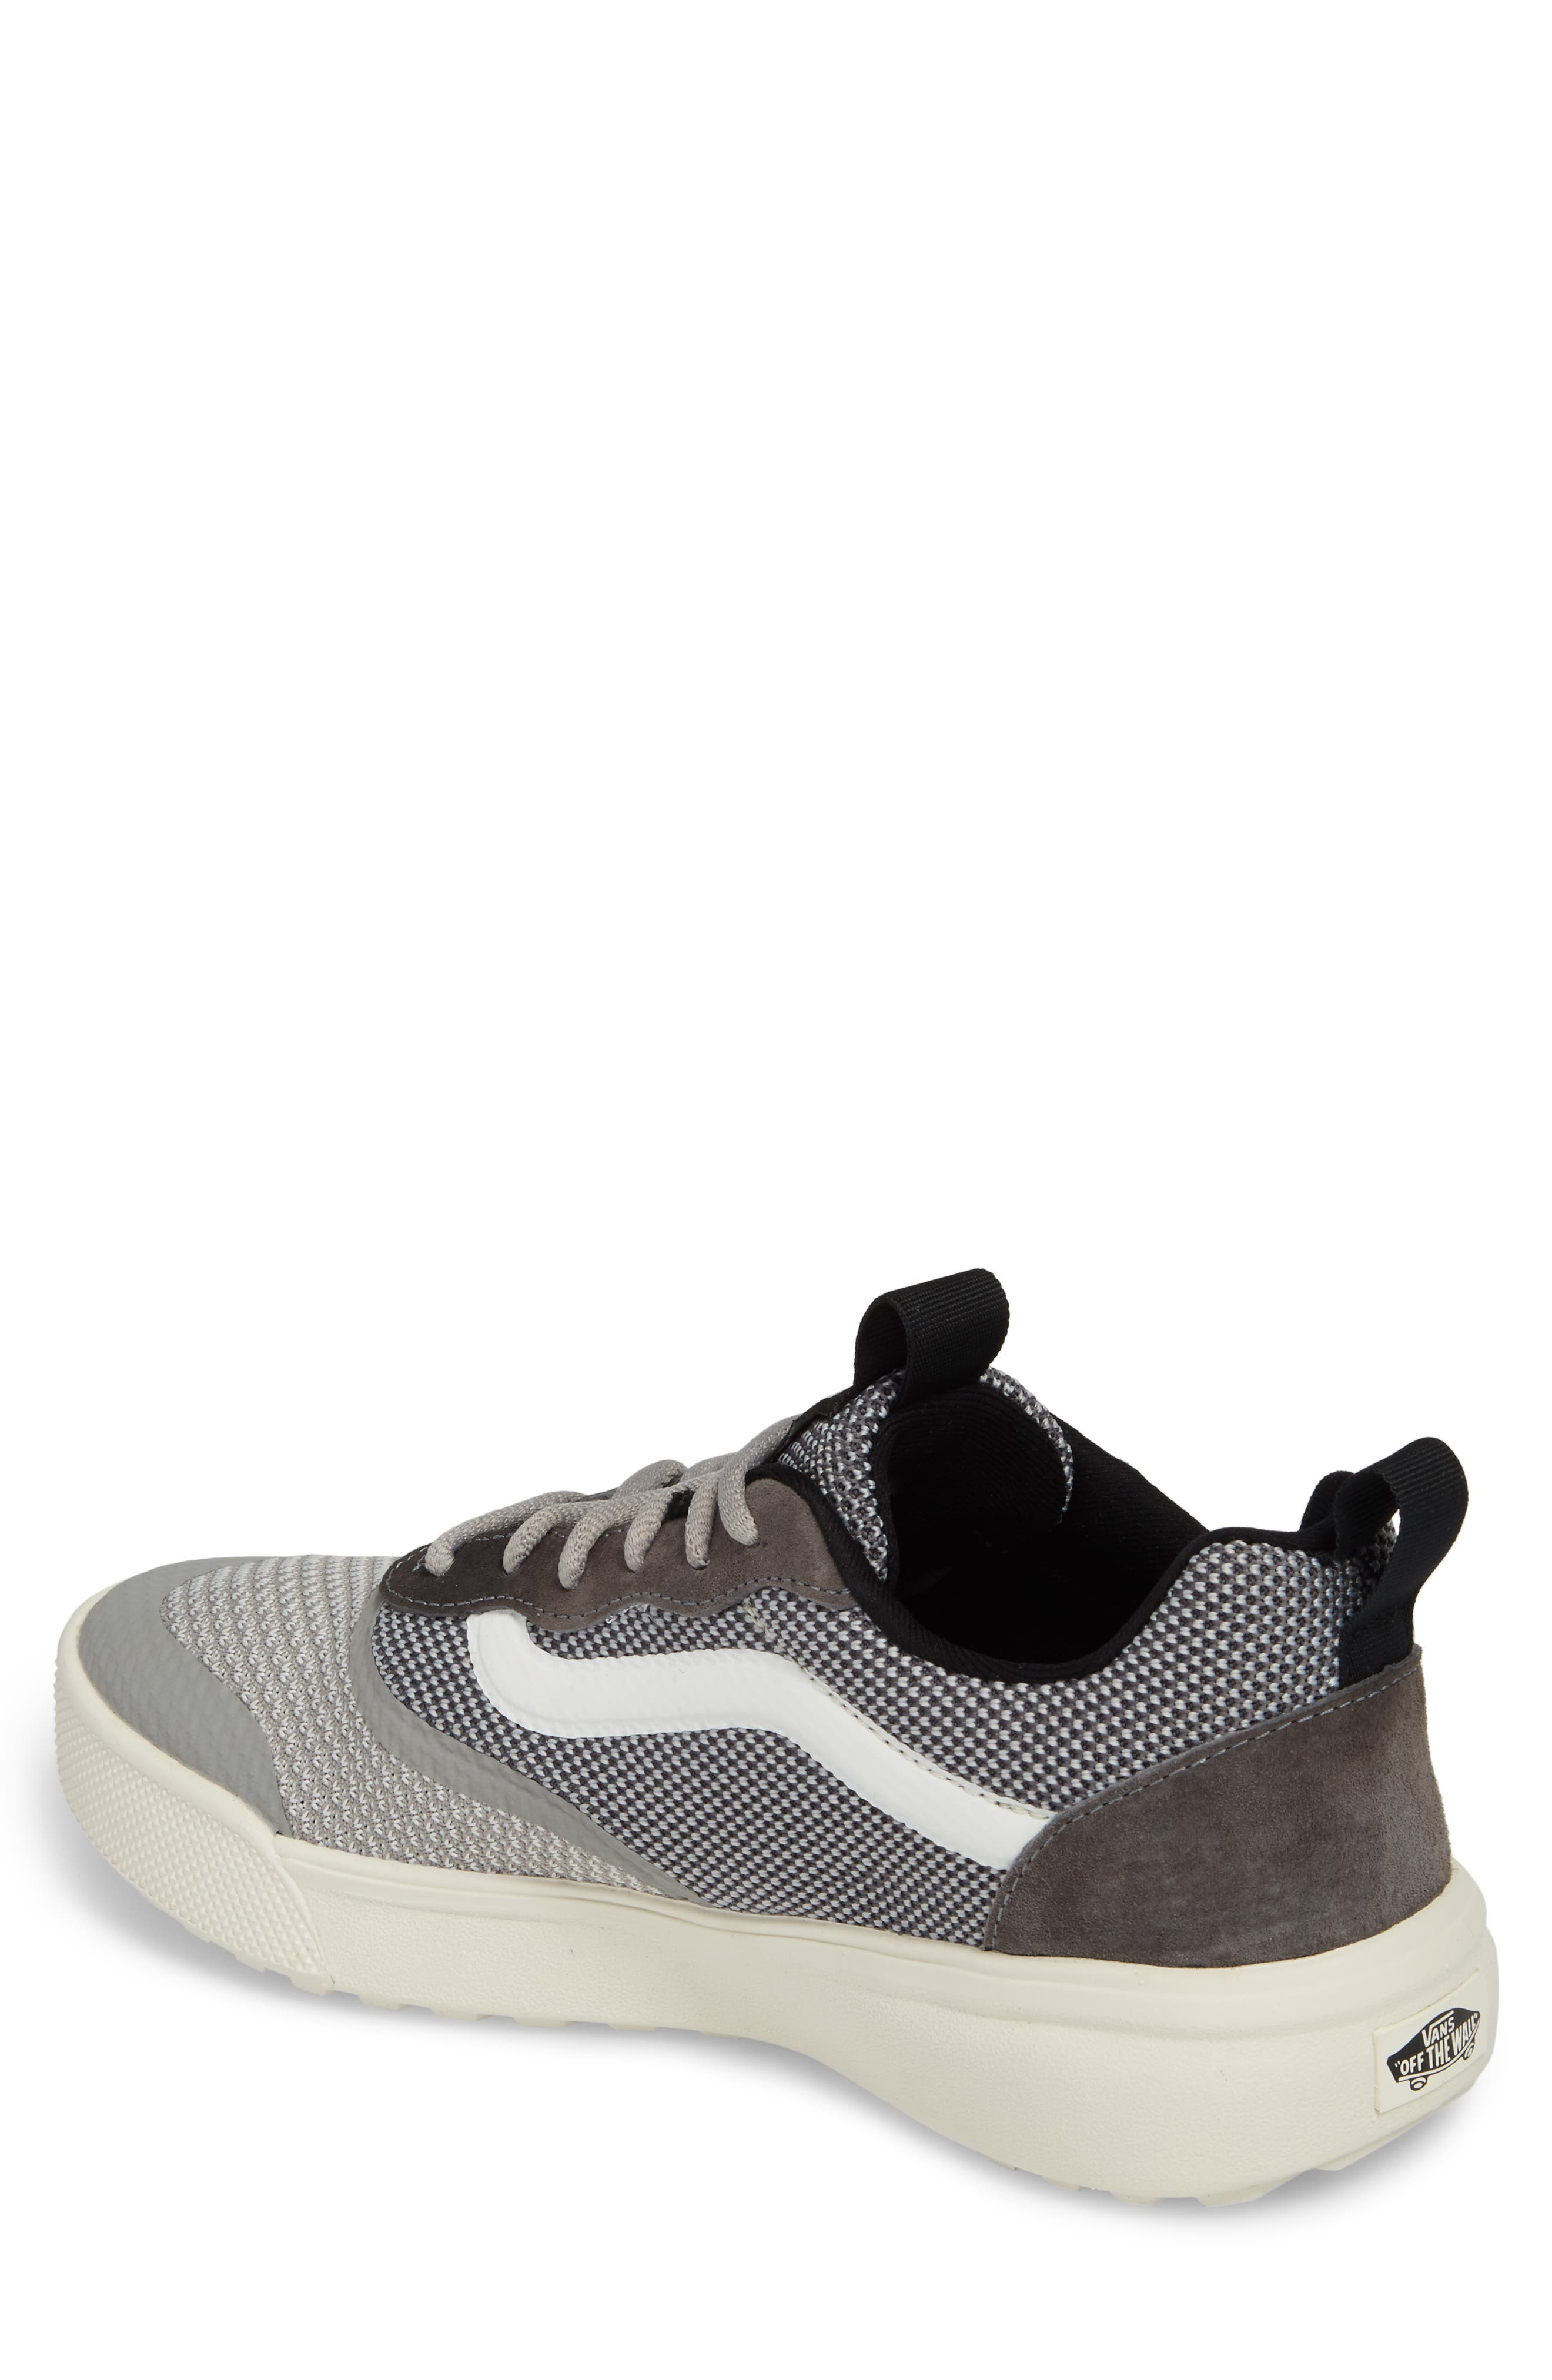 UltraRange DX Low Top Sneaker,                             Alternate thumbnail 2, color,